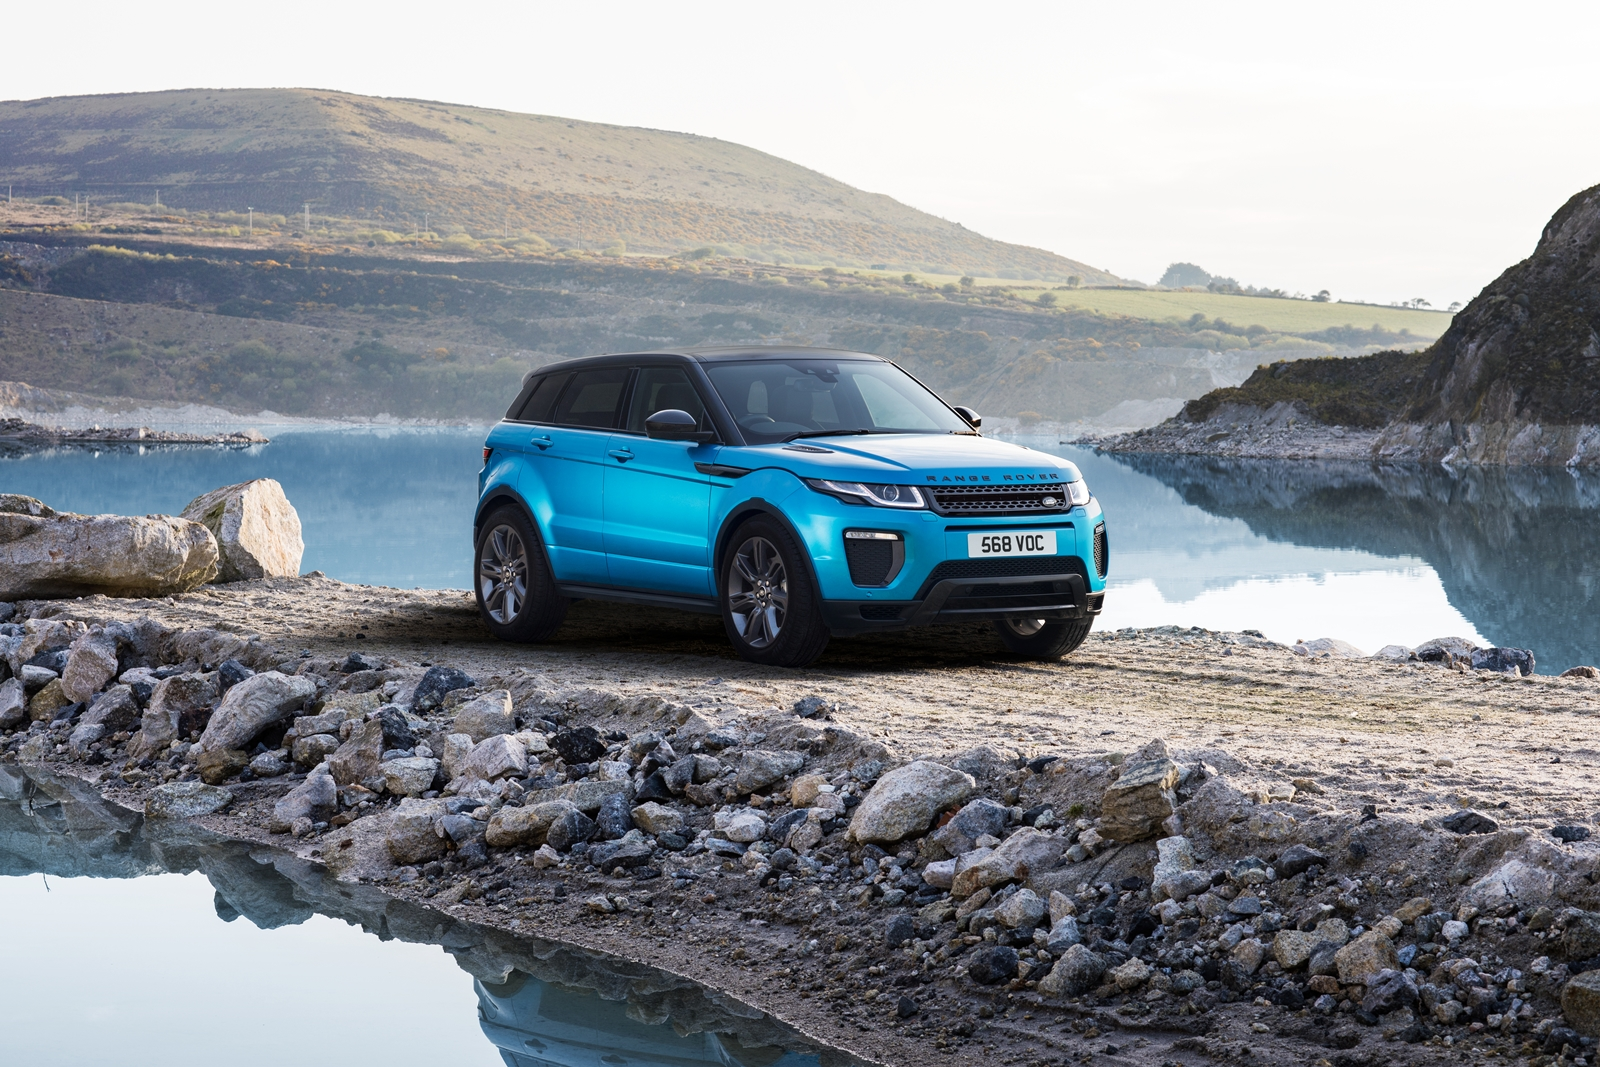 Range-Rover-Evoque-voi-mau-son-la-mat-anh-1